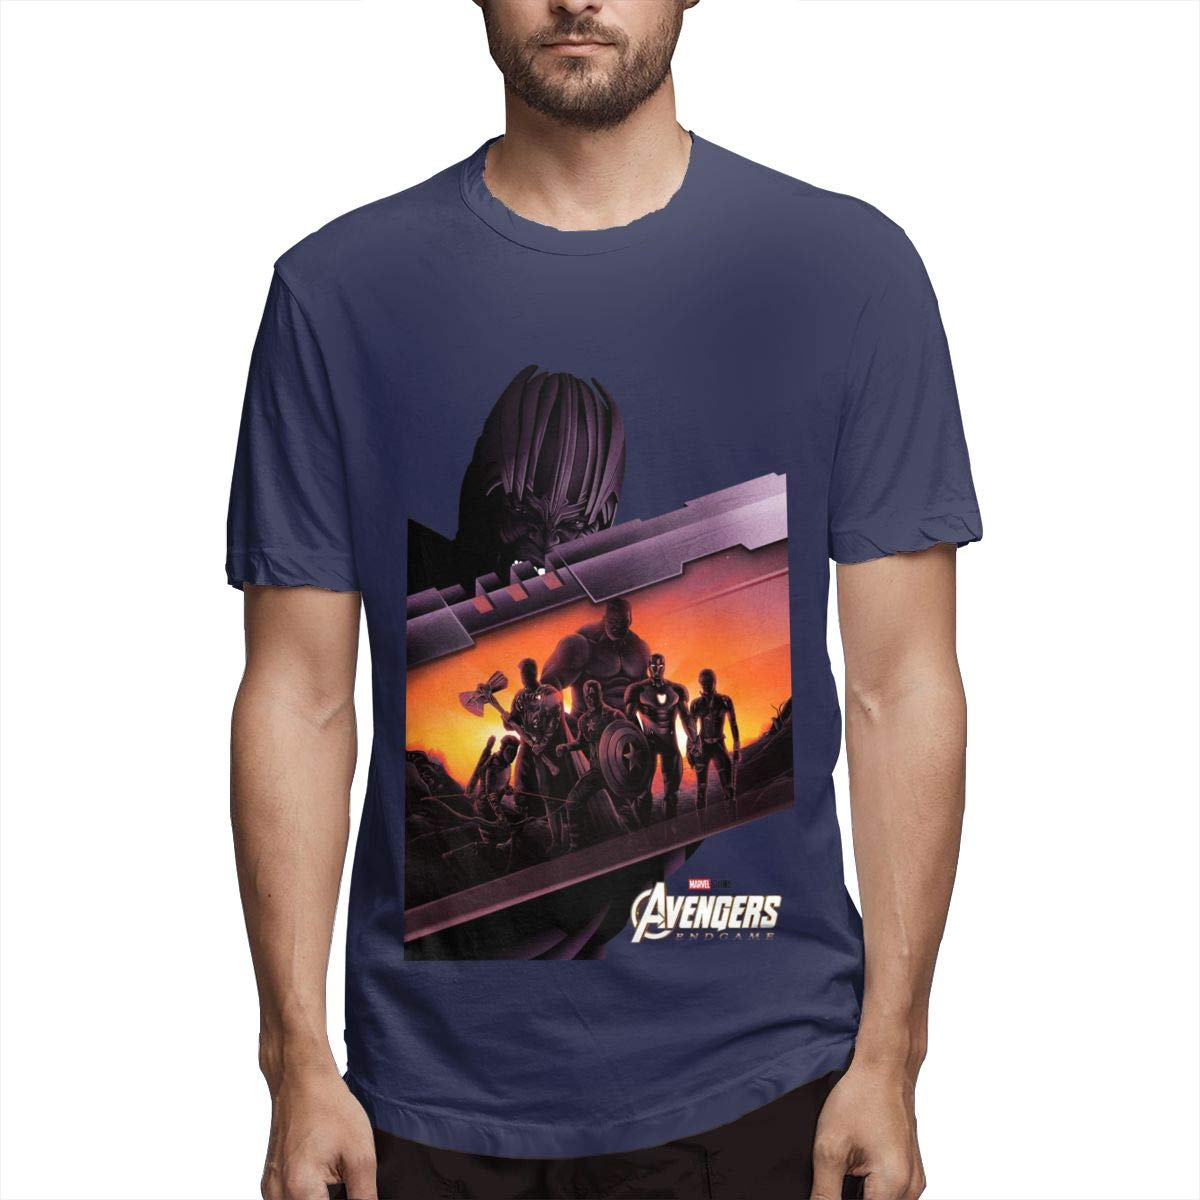 Nt Huatou S Printing Casual Endgame Short Sleeve Cool T Shirt 6756